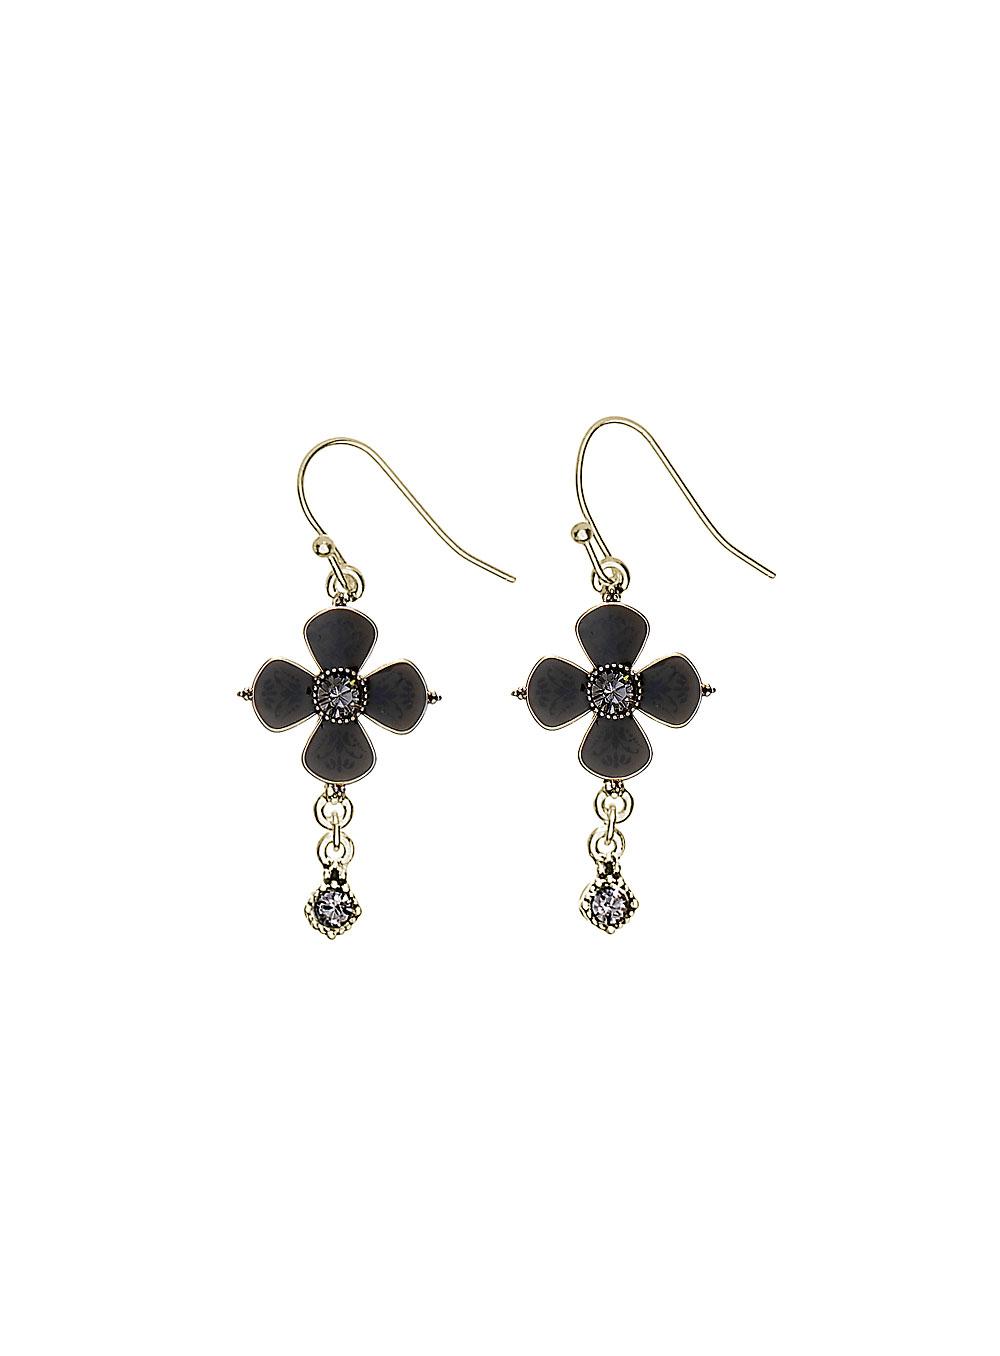 PILGRIM Devotion Flower Drop Earrings - Gold Plate Black Diamond (Grey) Swarovski Crystals BNWT